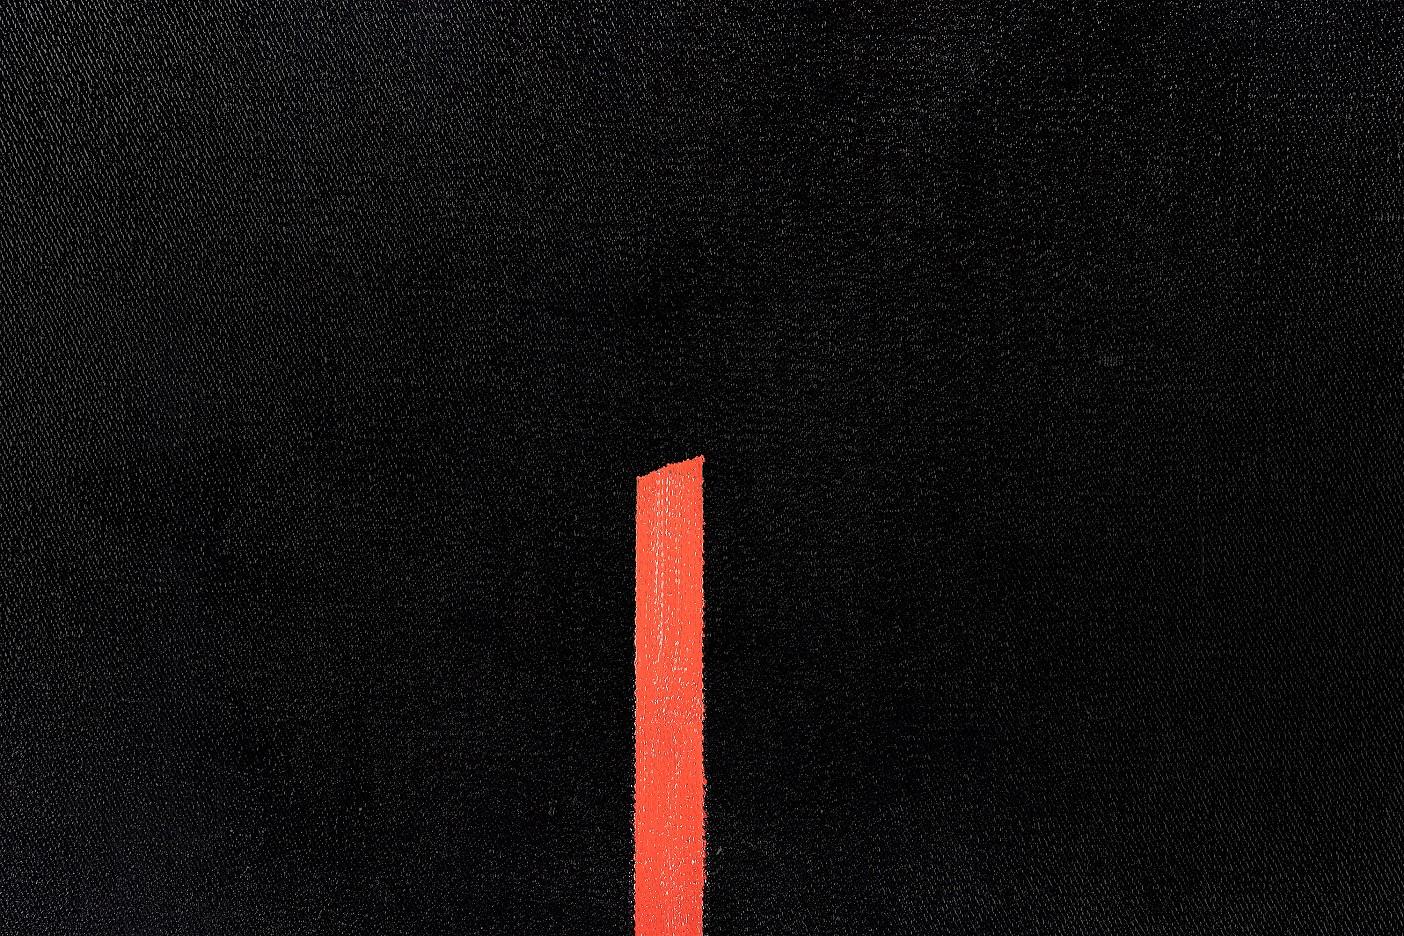 Vertikal 19